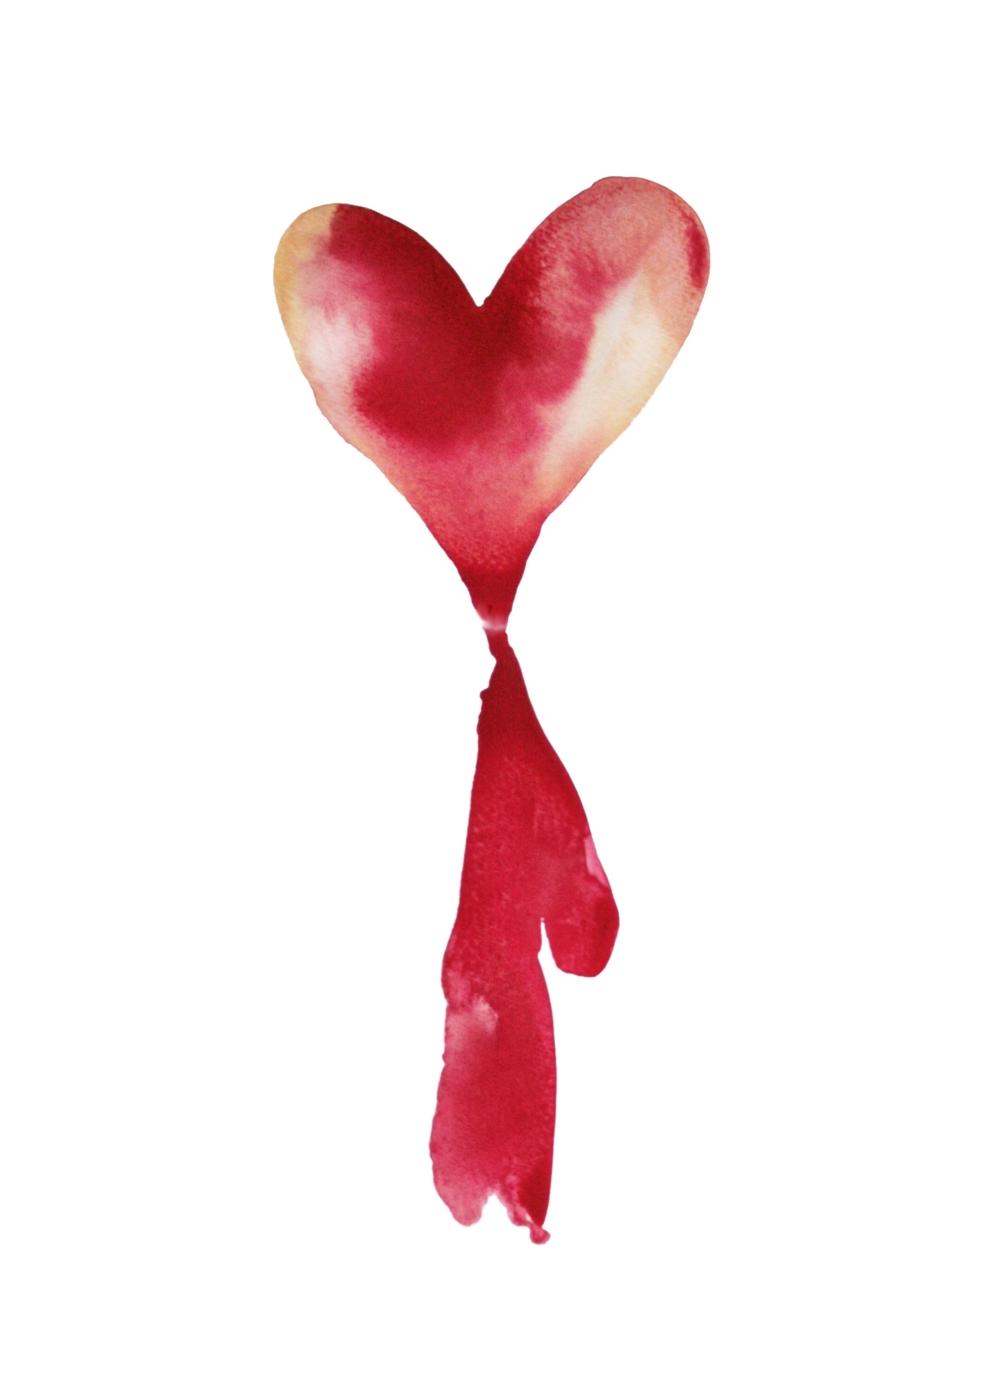 Love that bleeds (L'amour qui saigne)  , 2013, watercolor on paper, 29,7x43cm, private collection